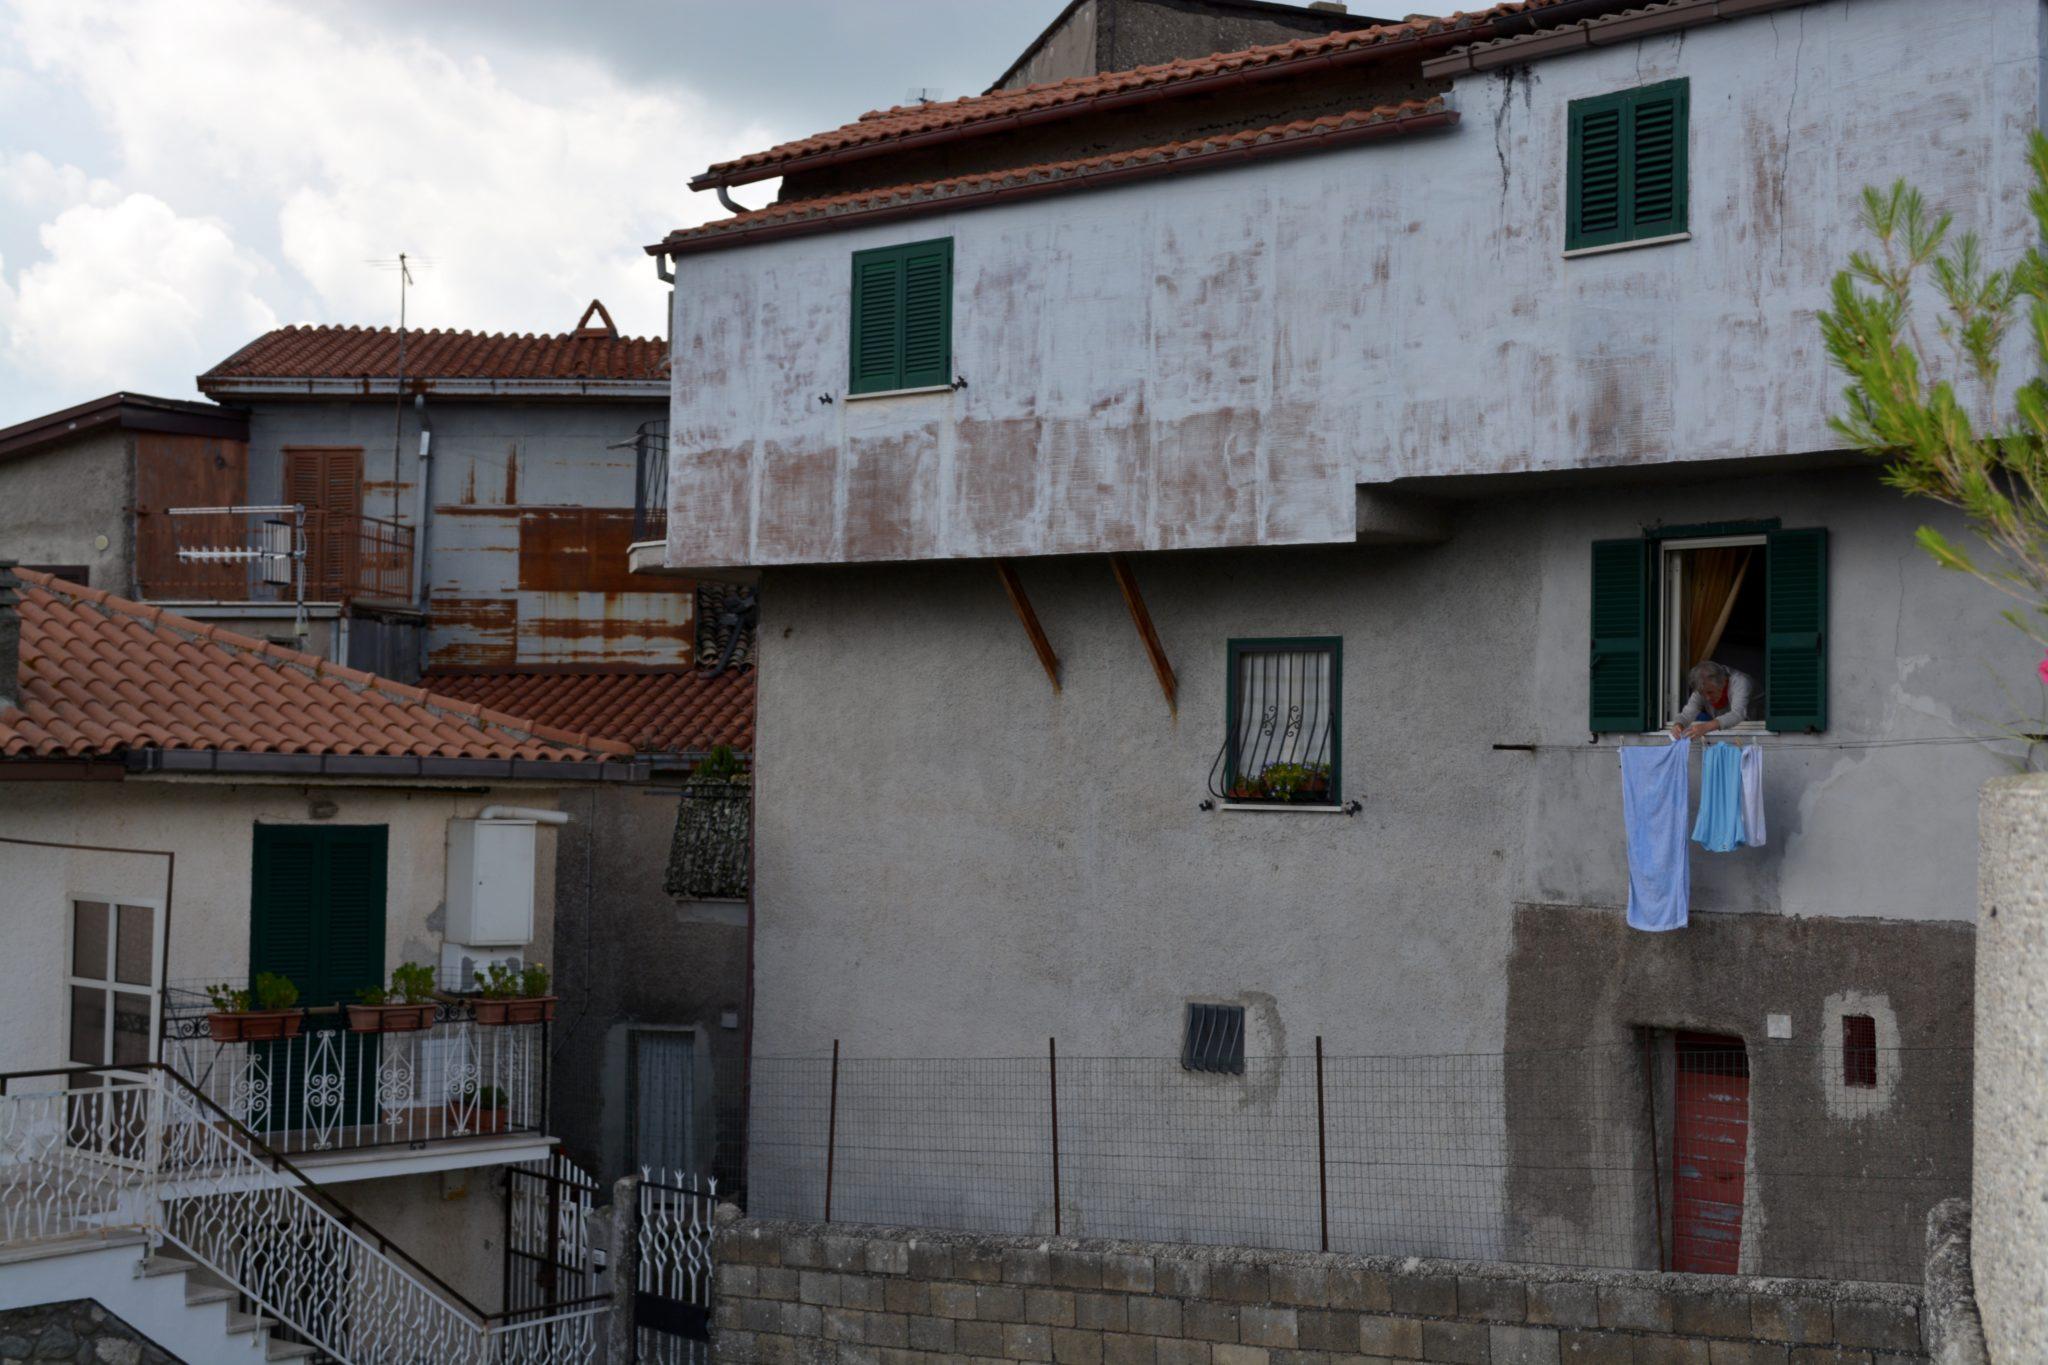 italian woman laundry